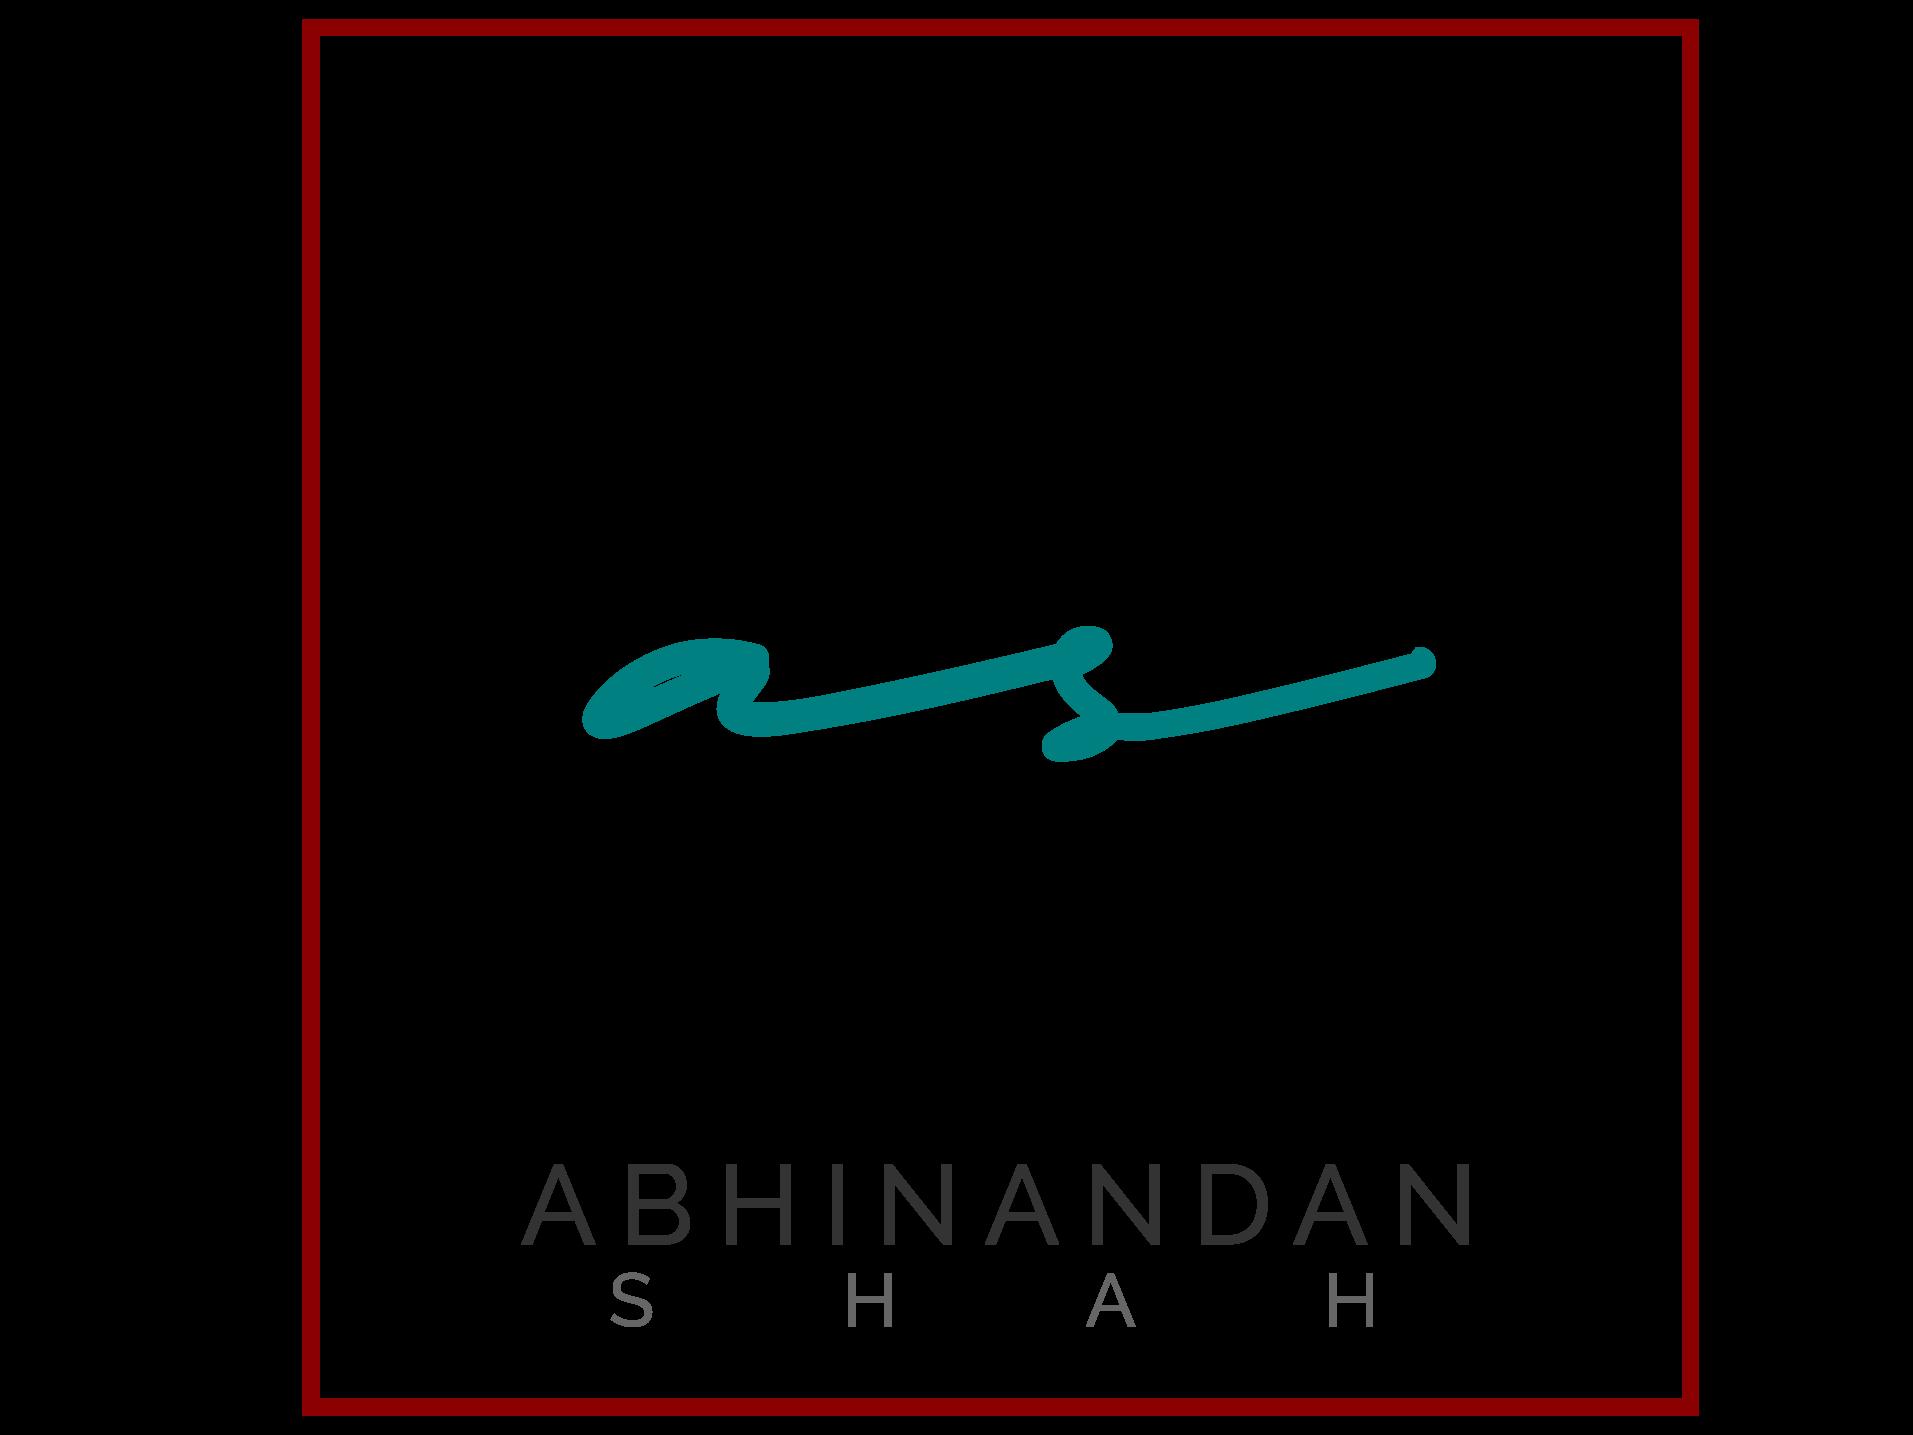 Abhinandanshah.com